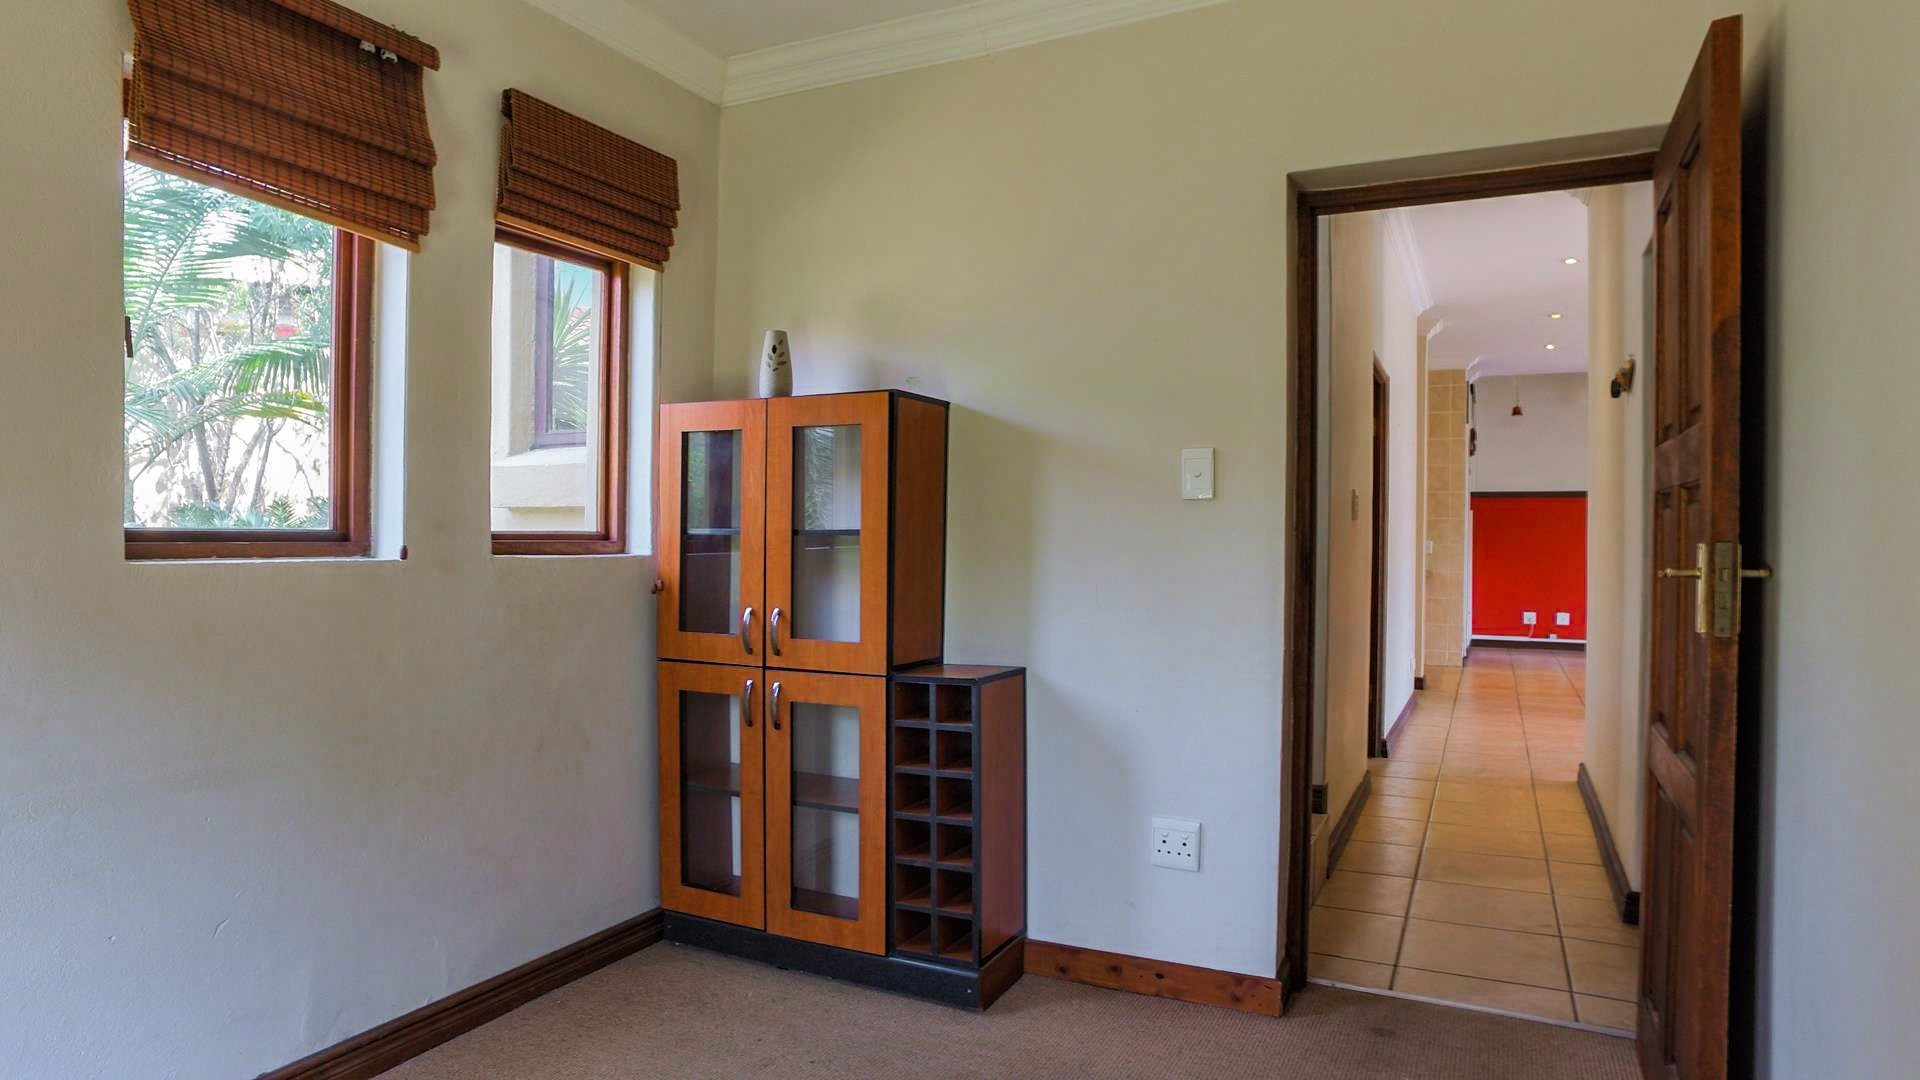 Irene View Estate property for sale. Ref No: 13519995. Picture no 25